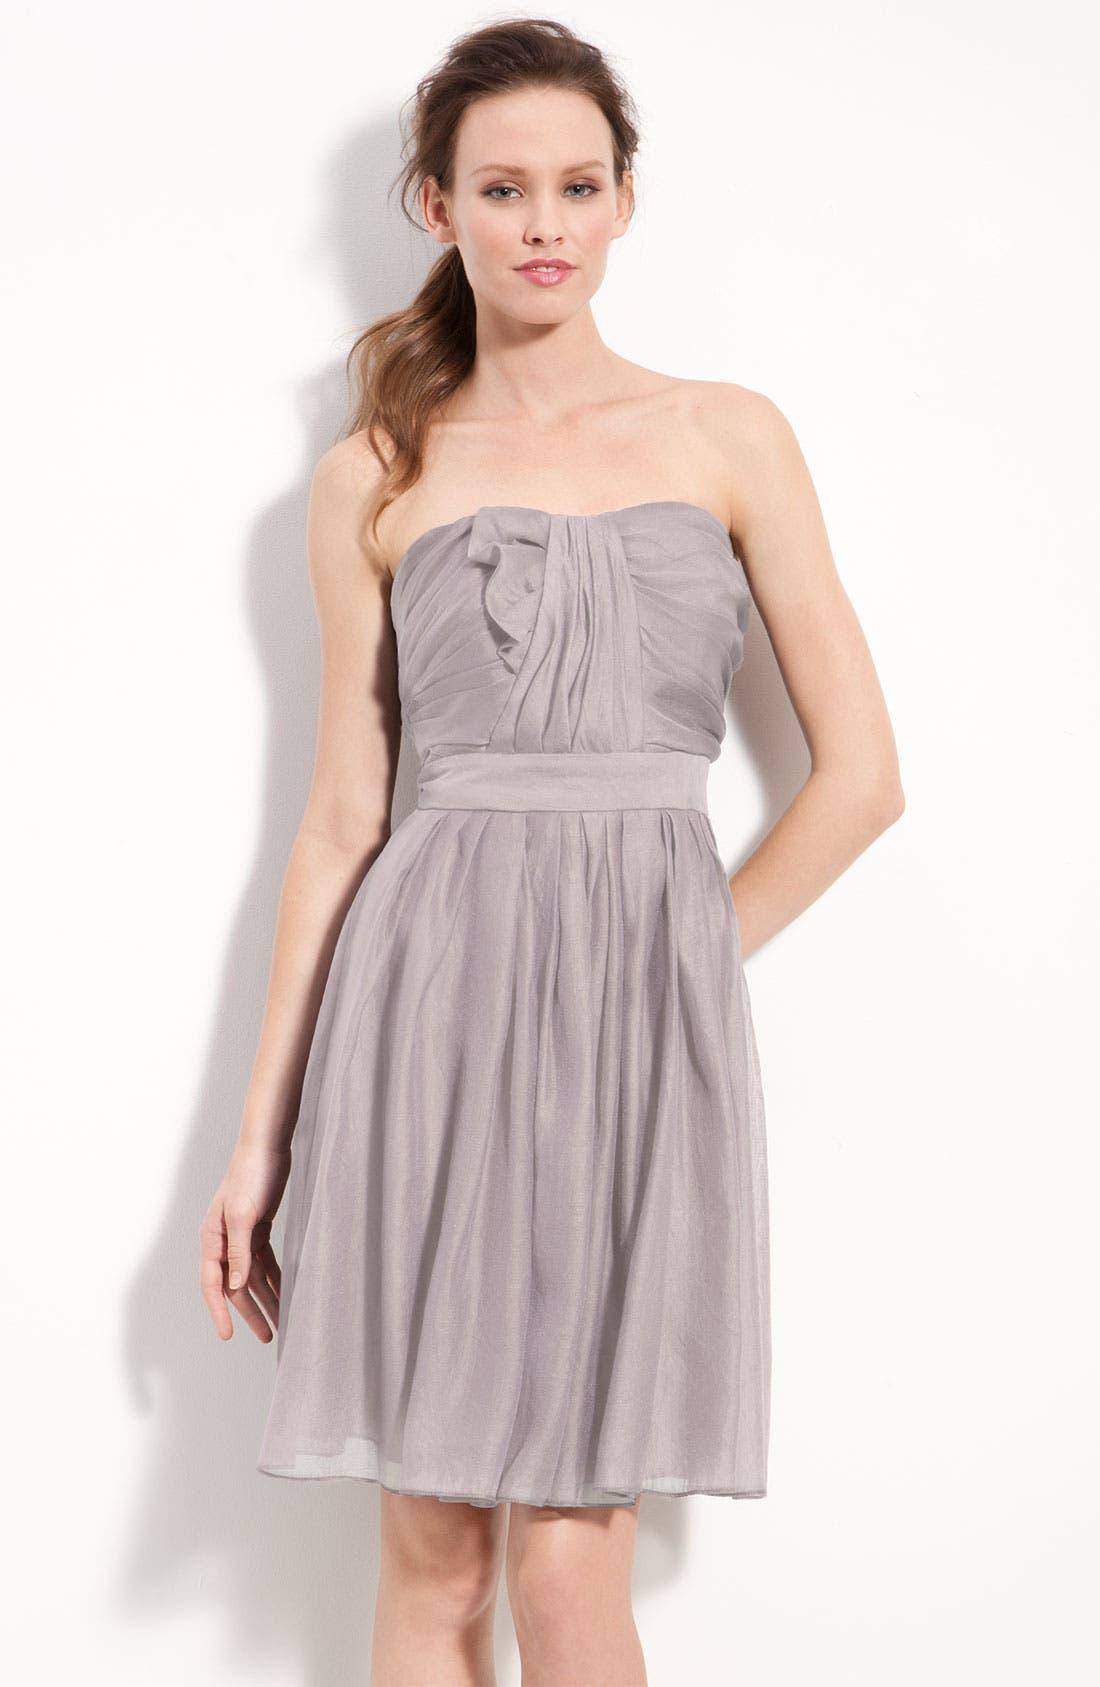 Main Image - Suzi Chin for Maggy Boutique Strapless Draped Organza Dress